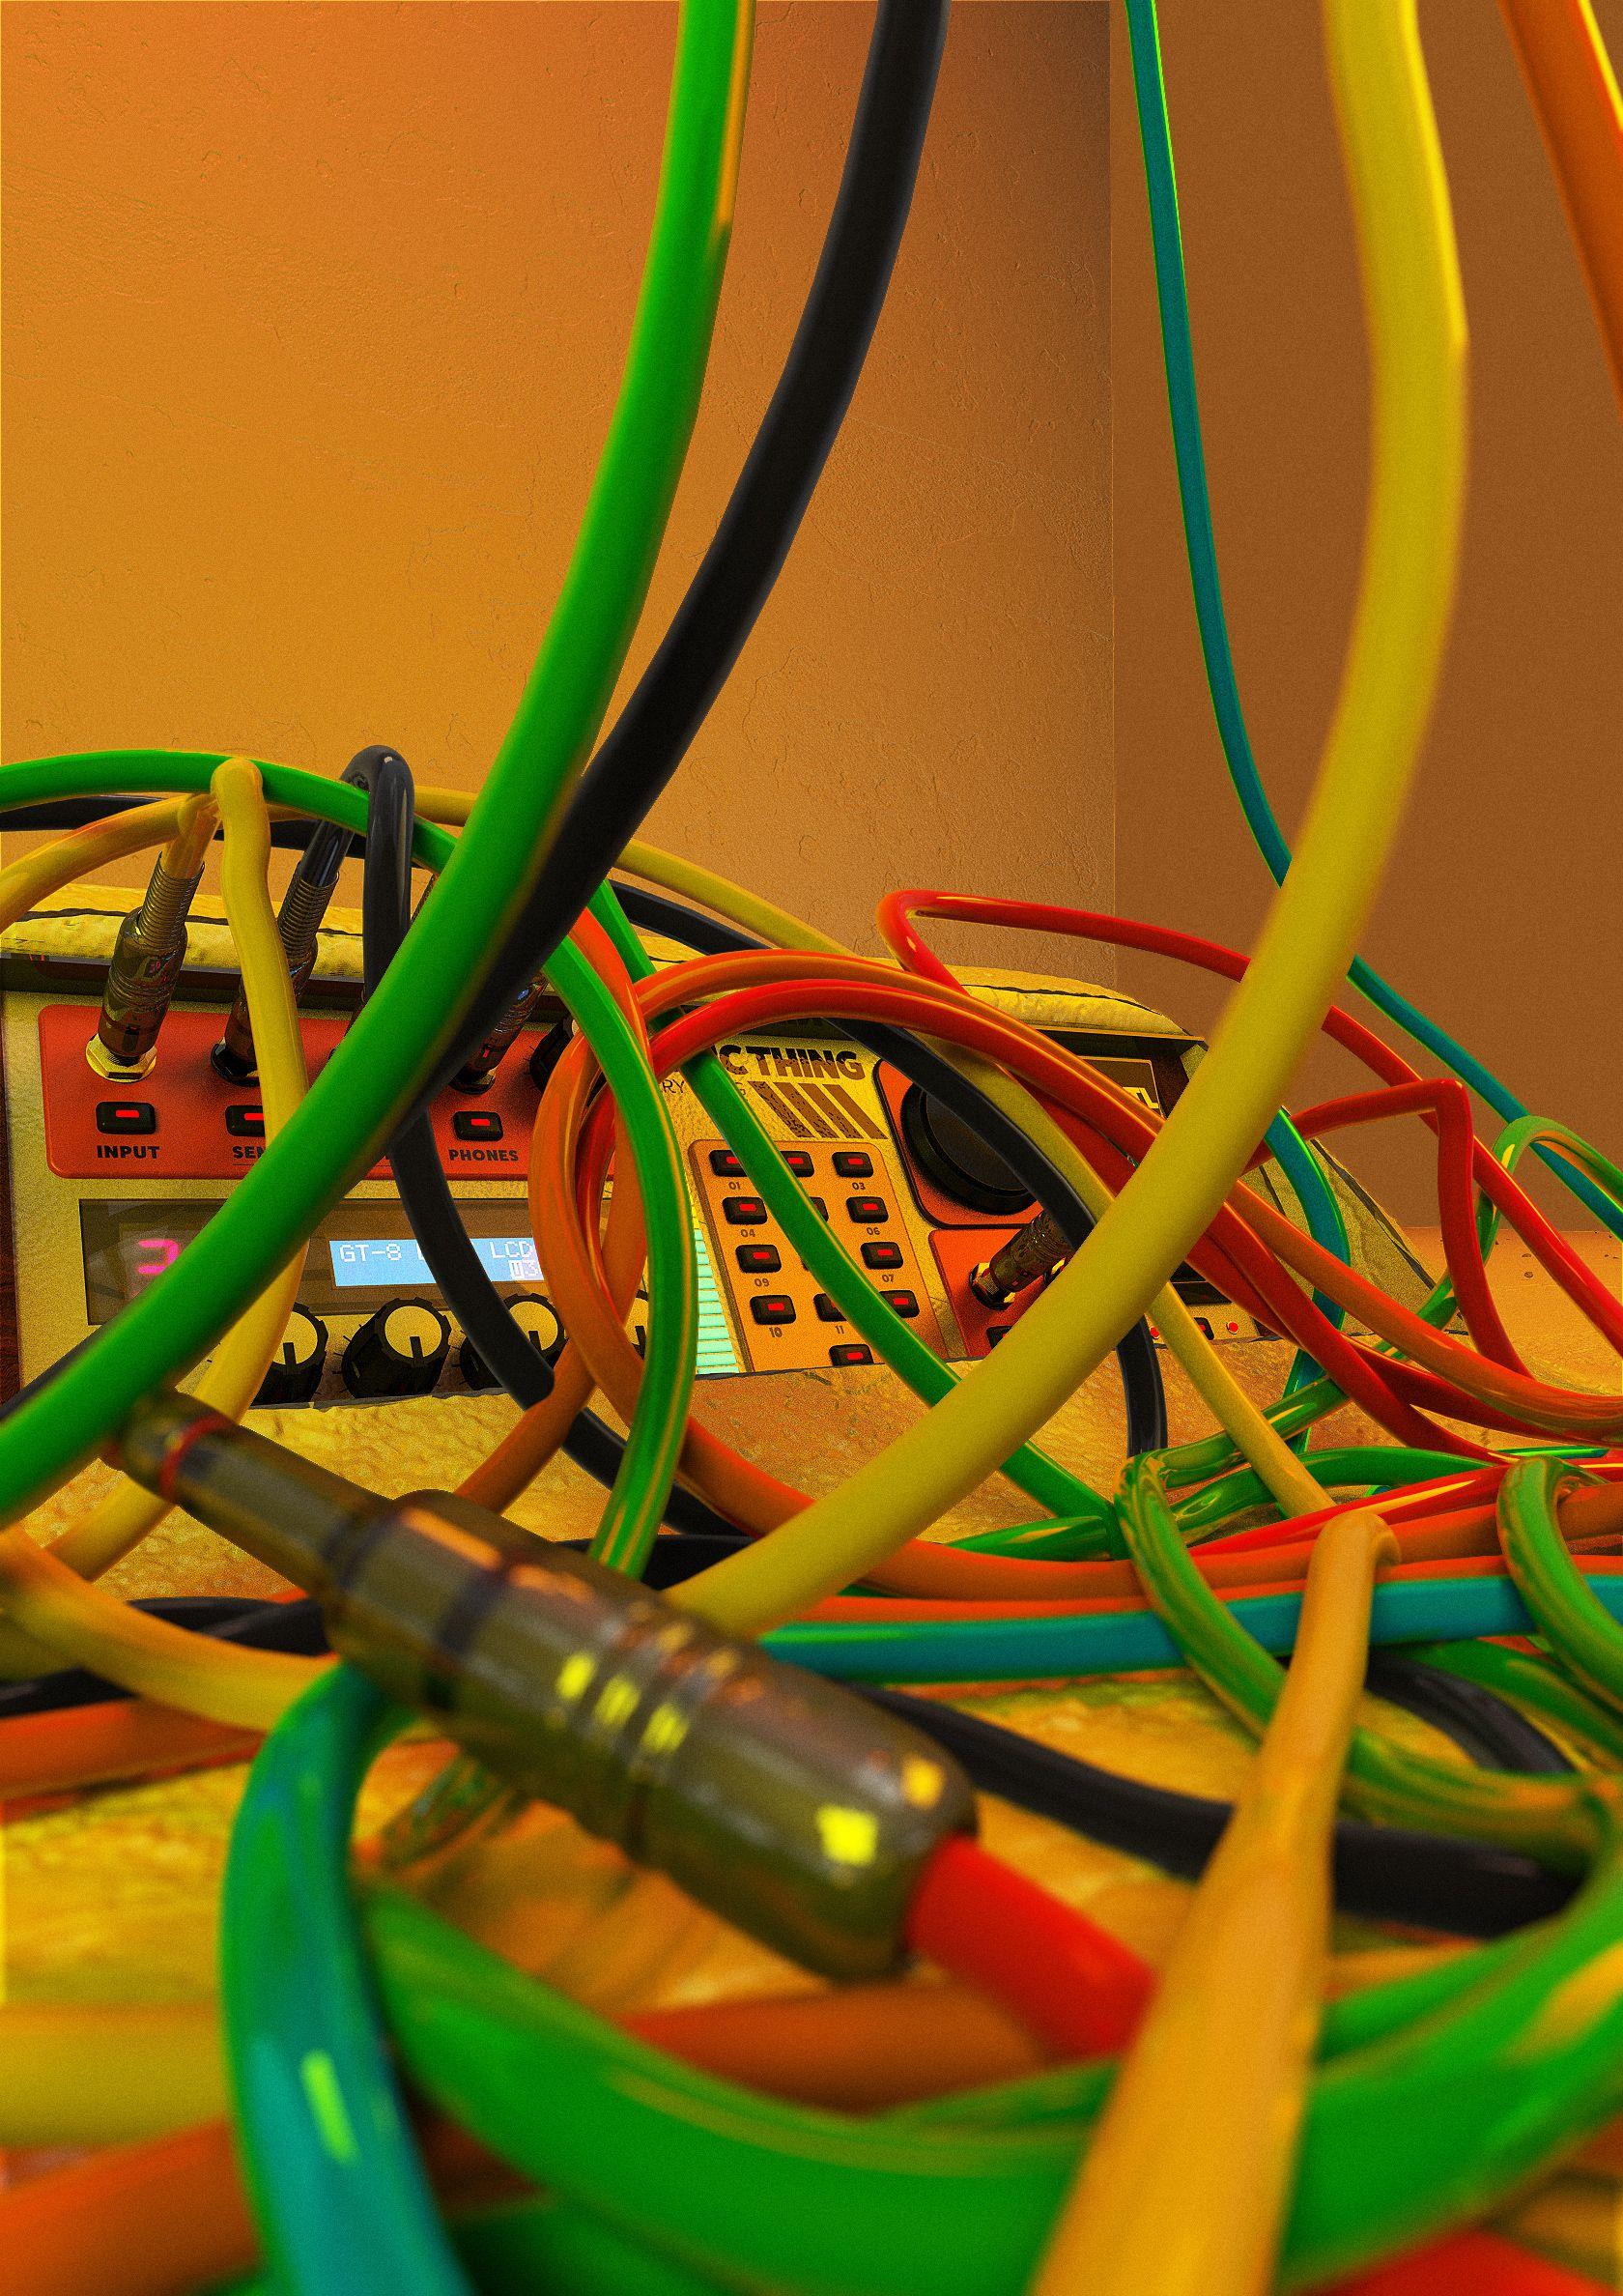 crazy wires experiments in spline dynamics [ 1680 x 2376 Pixel ]